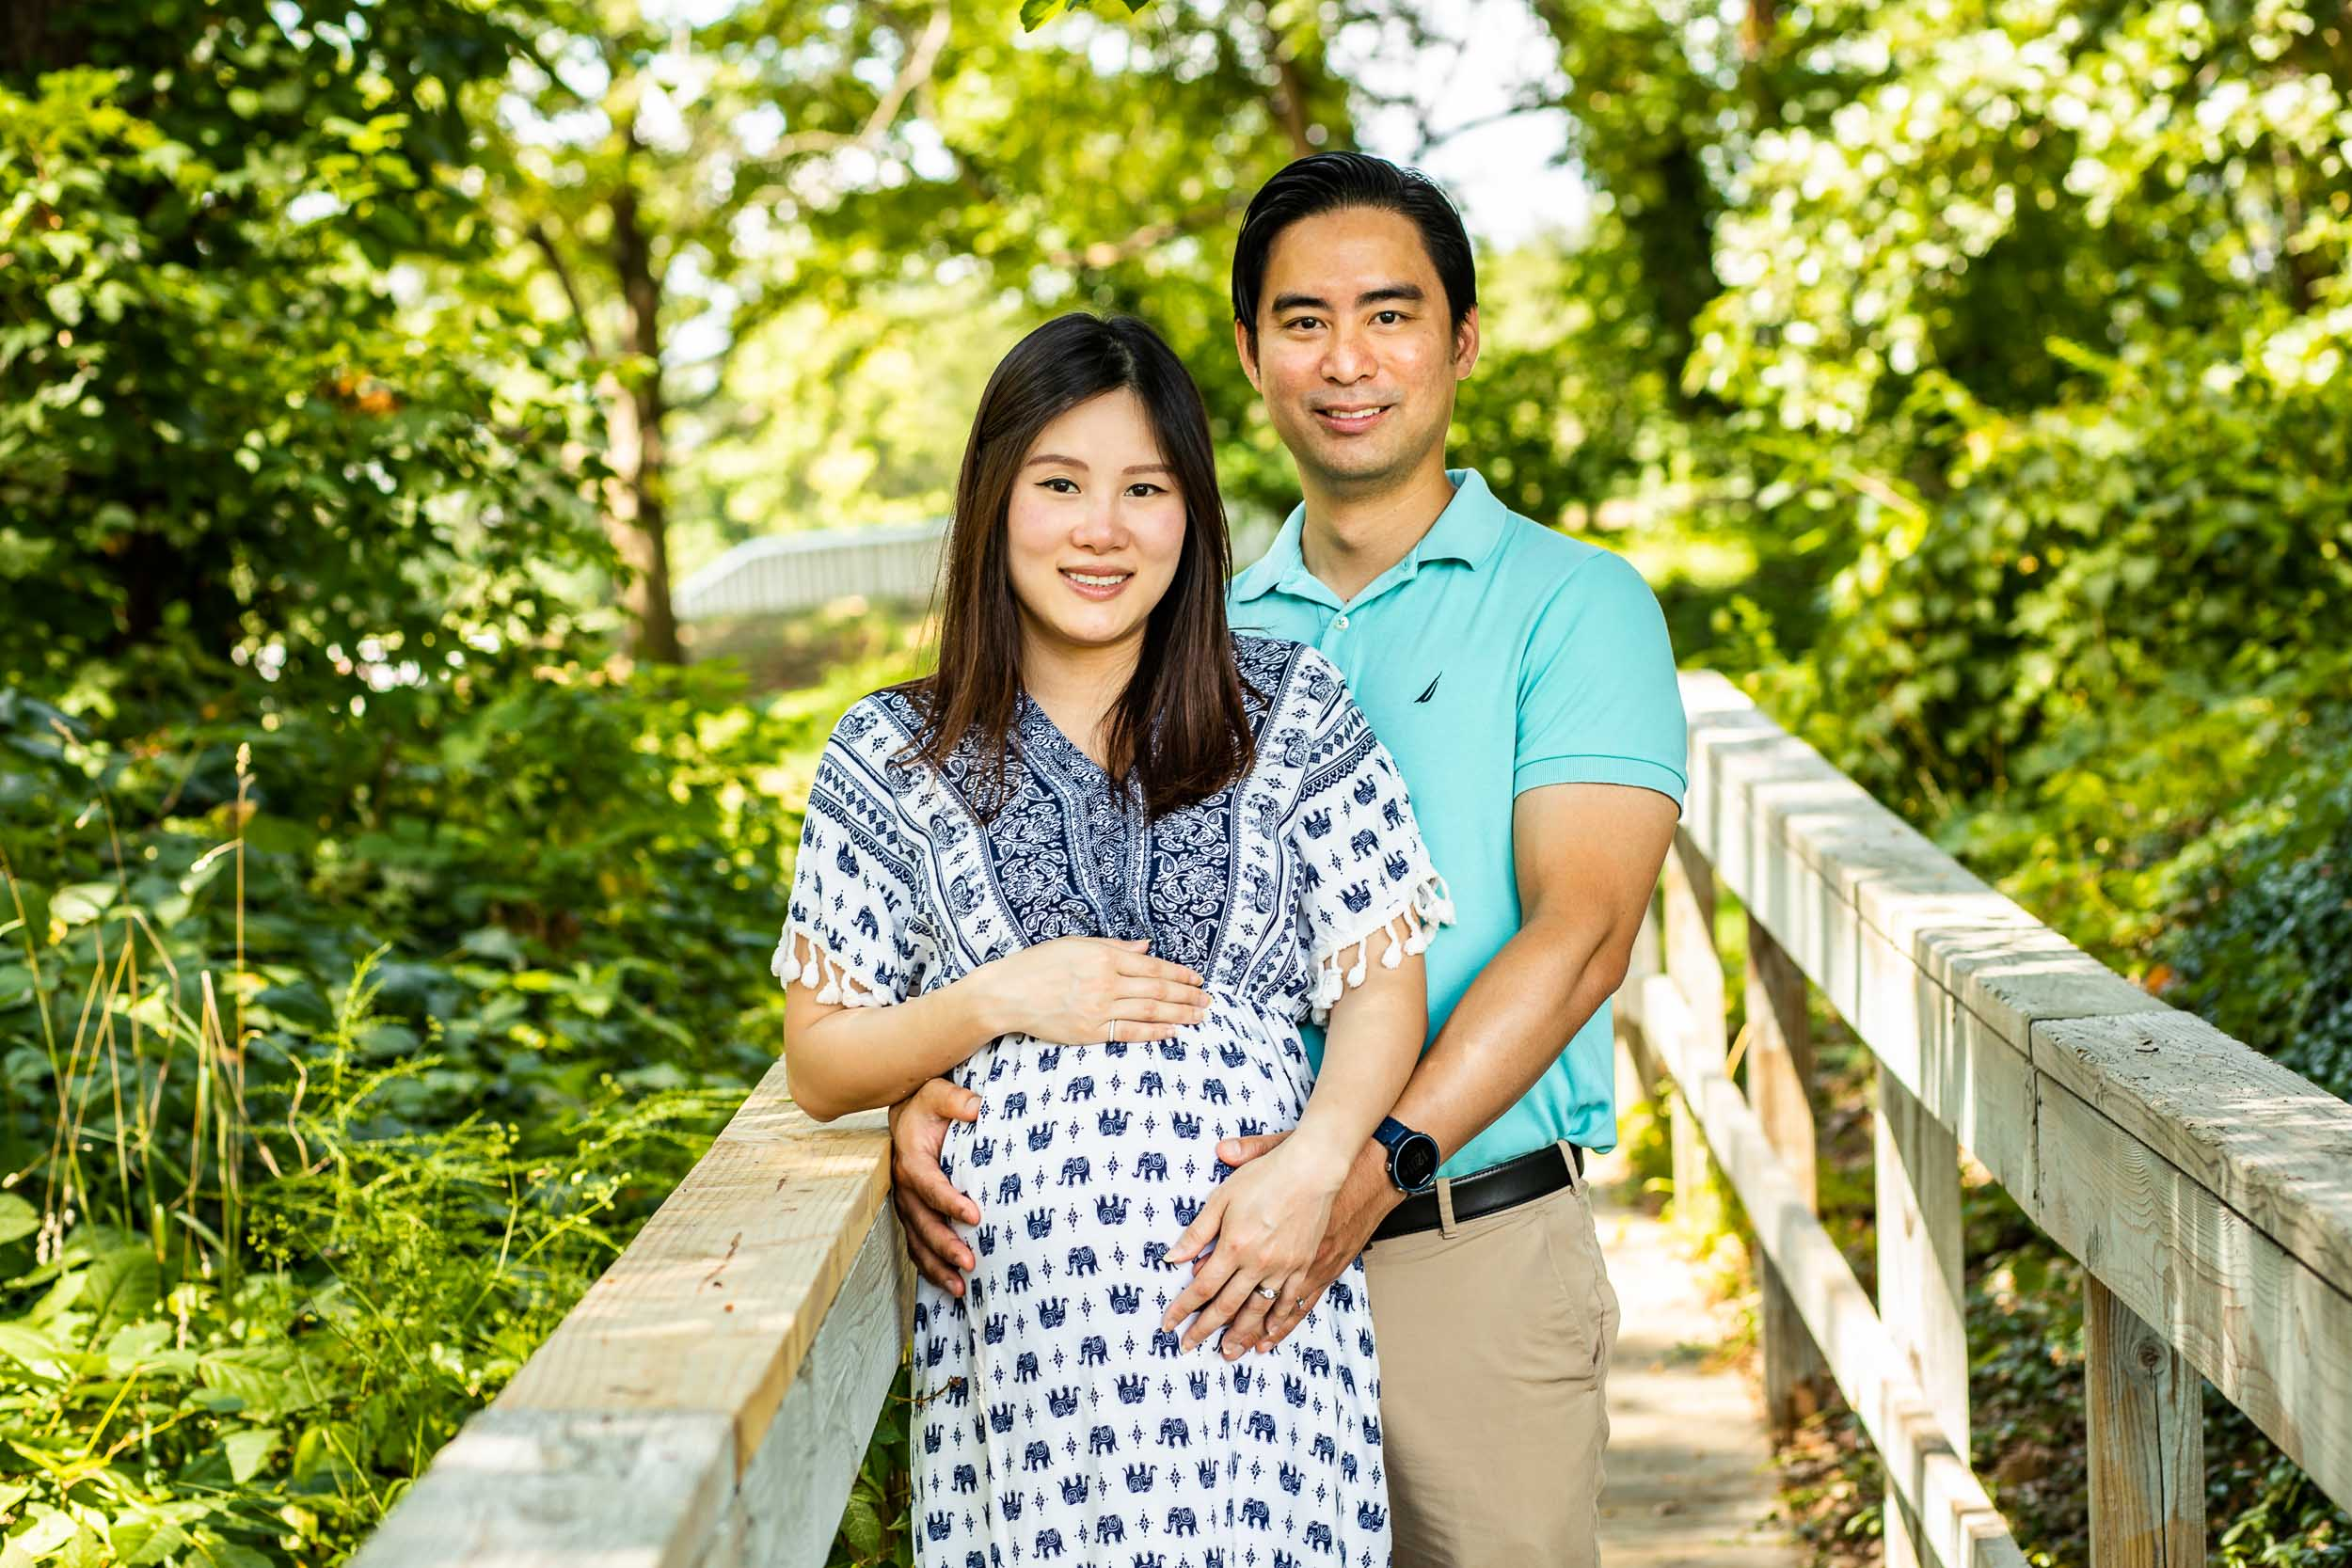 Alexandria VA Maternity Photos Nancy Han Tara Parekh Photography -1.jpg